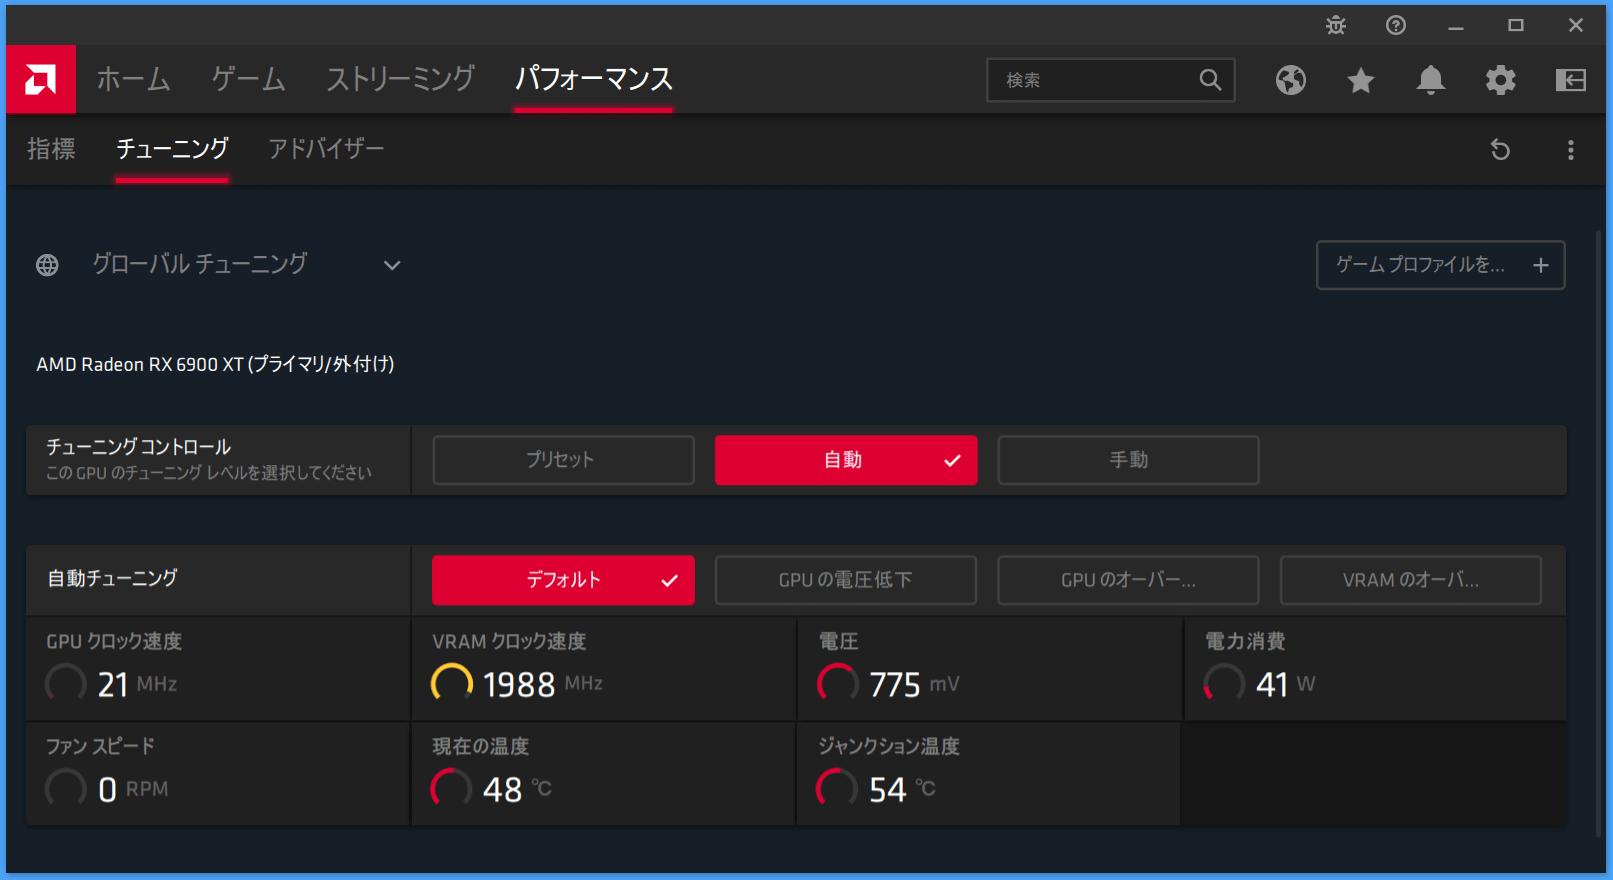 Radeon RX 6900 XT_Radeon-Setting_1